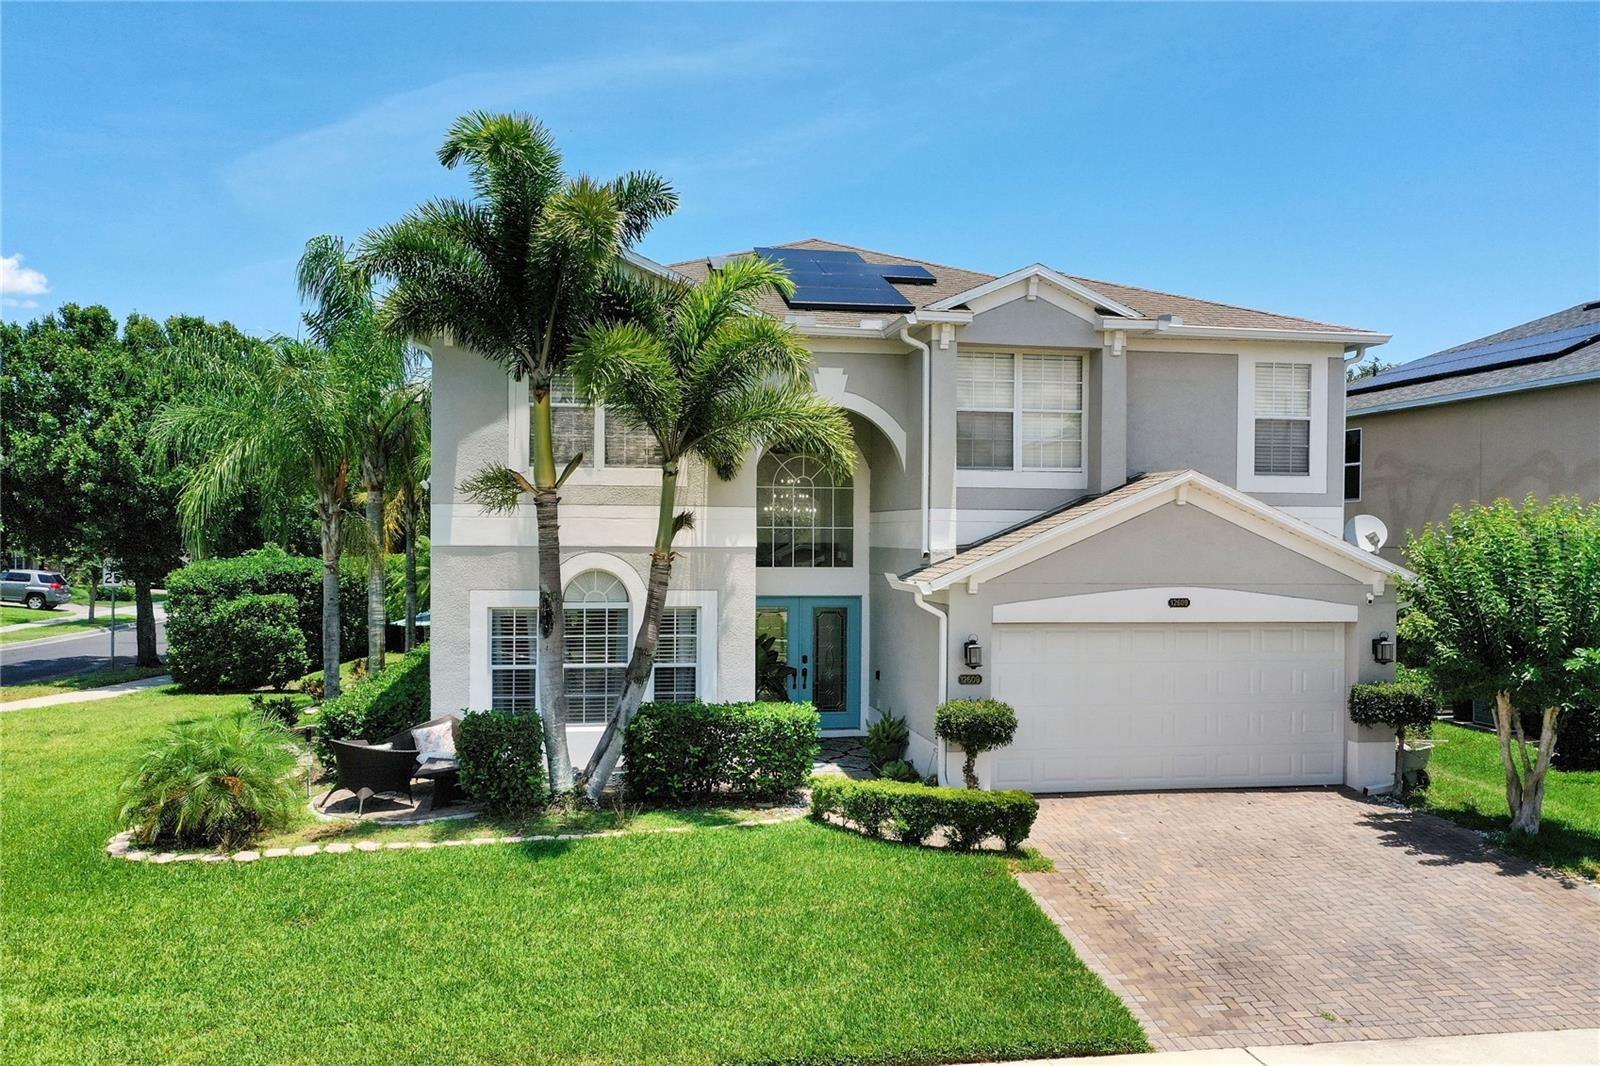 12609 WEATHERFORD WAY, Orlando, FL 32832 - MLS#: O5948795